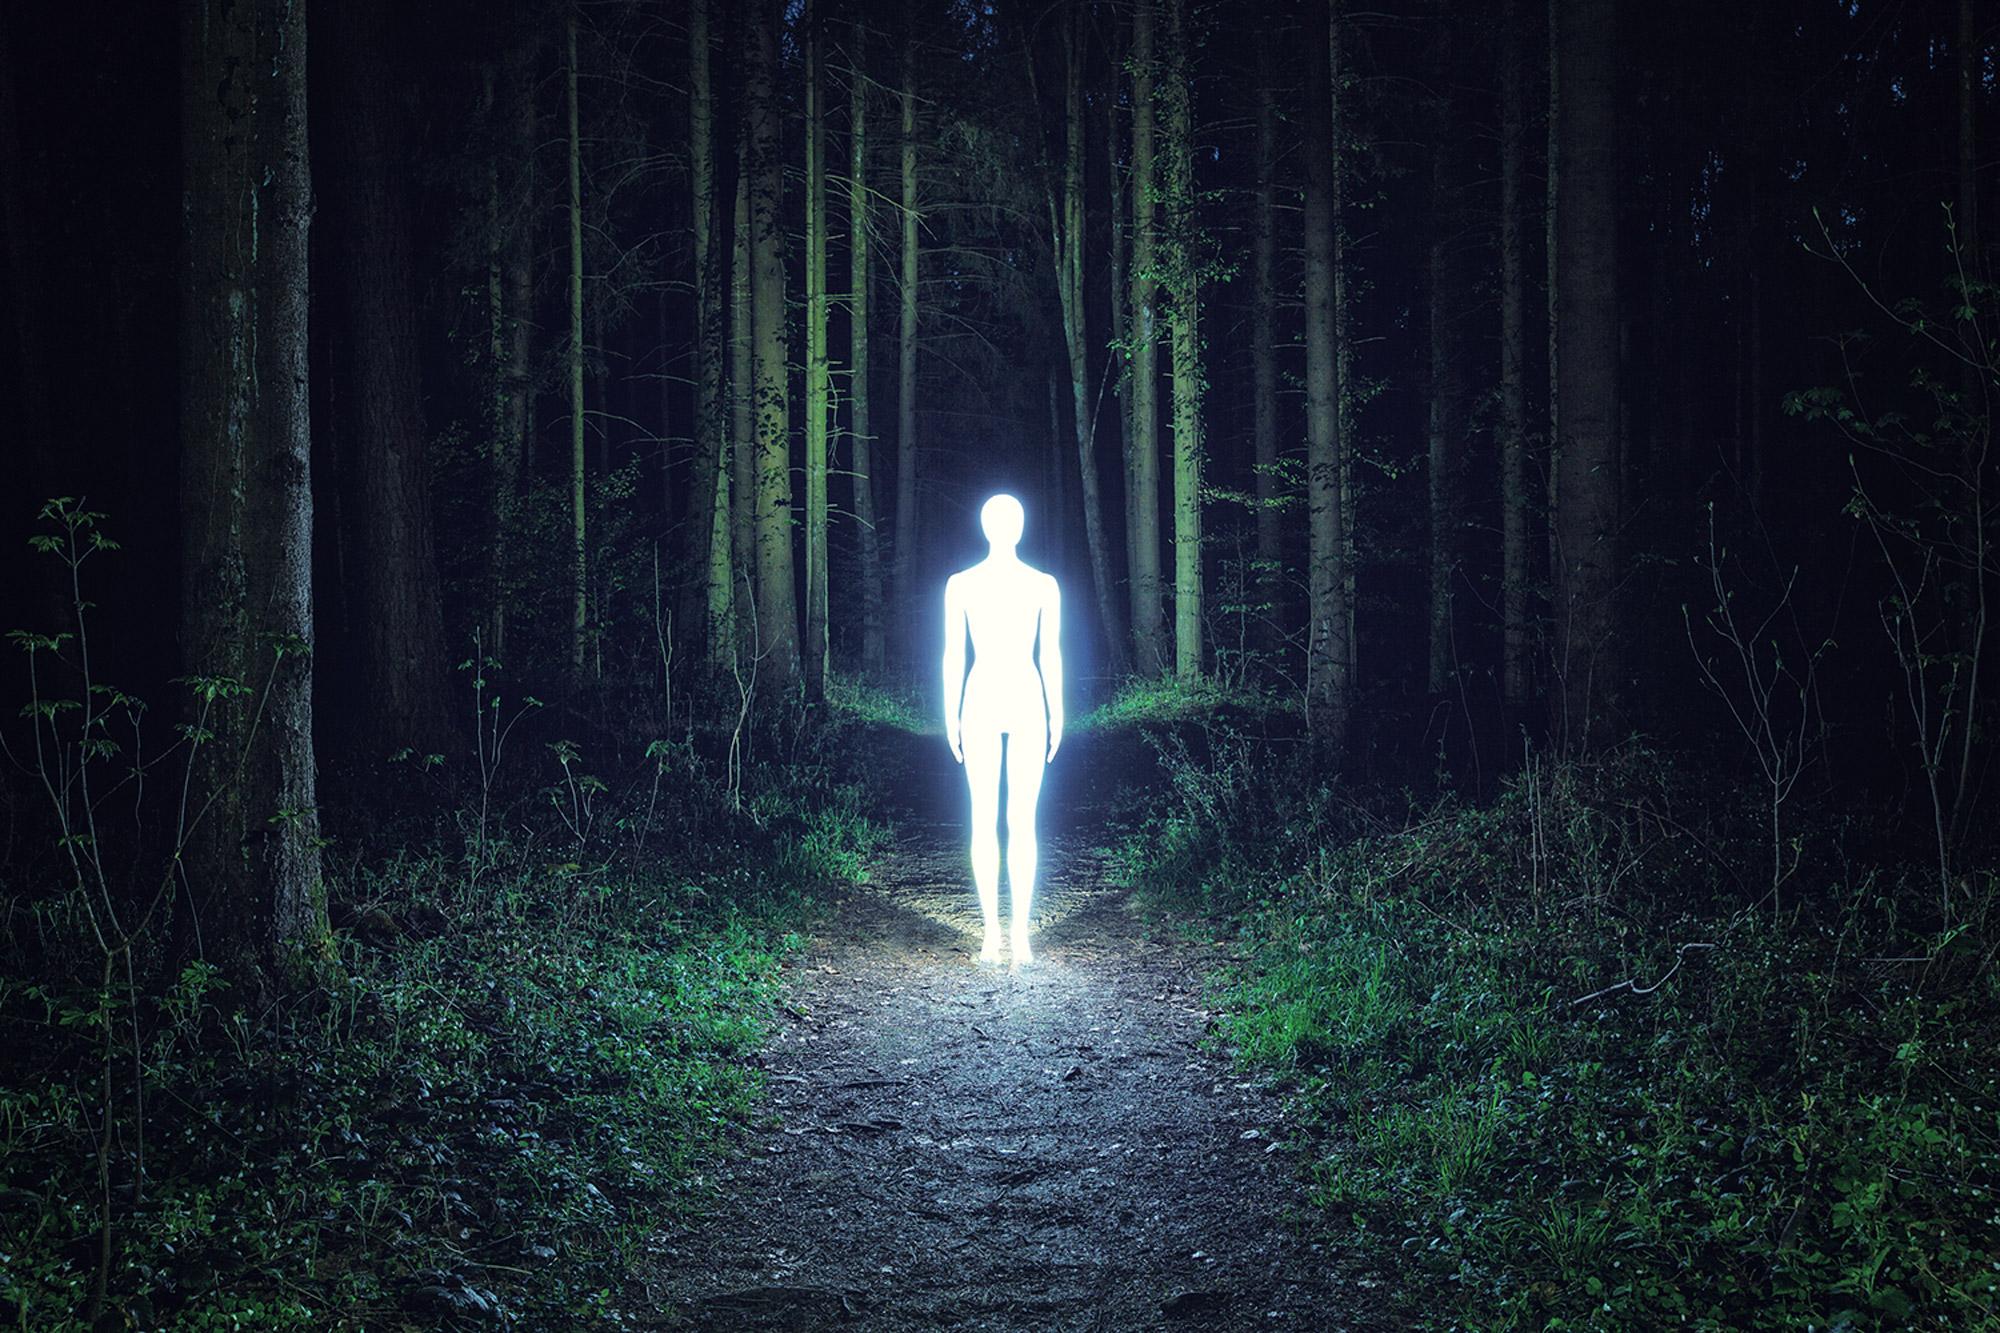 Severin Ettlin, HOMOLUX - illuminated body on forest path